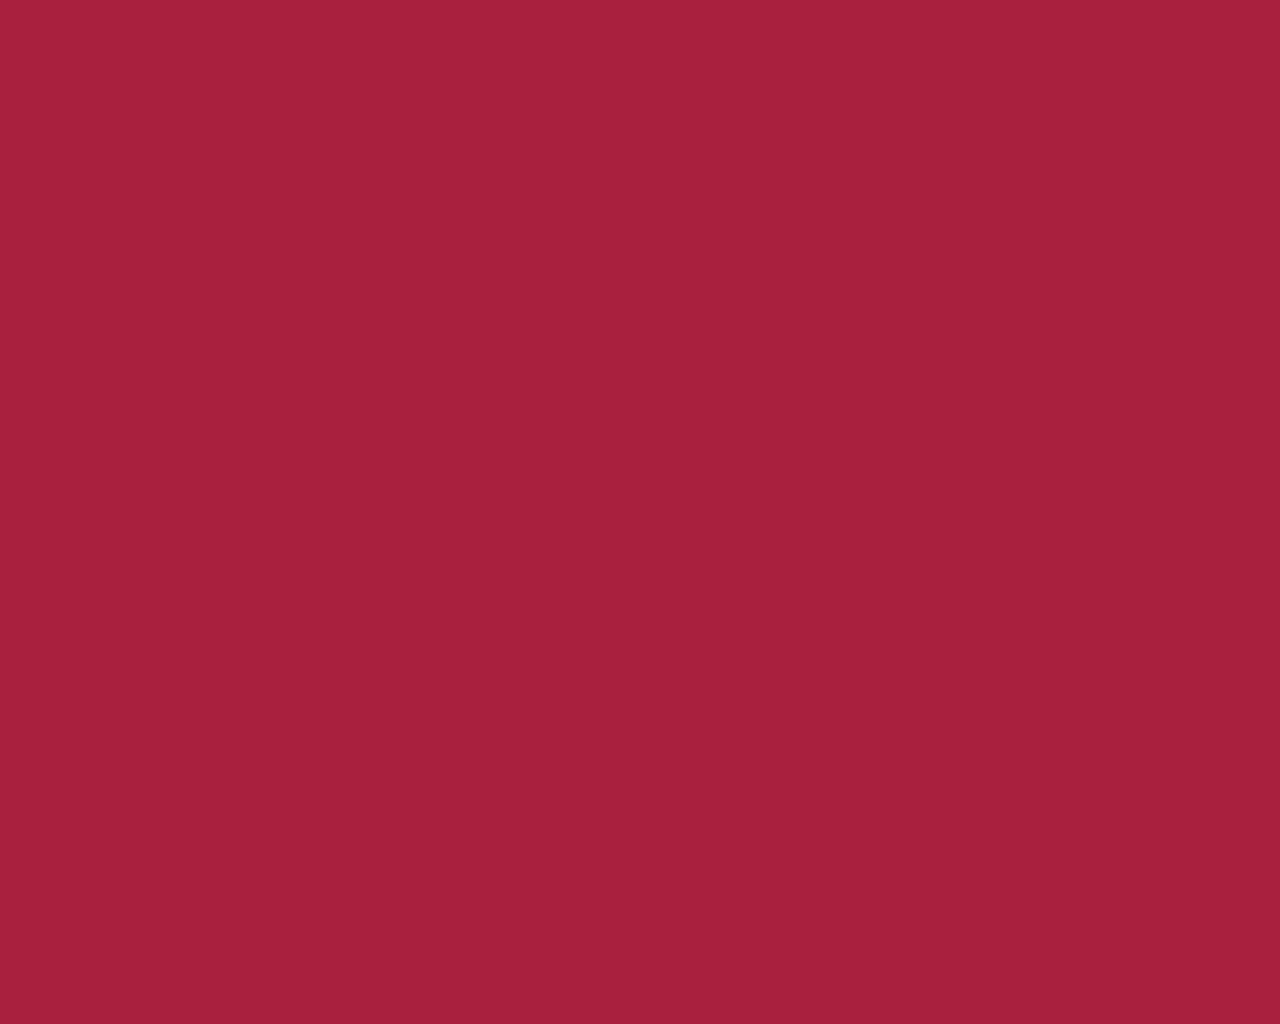 1280x1024 Deep Carmine Solid Color Background